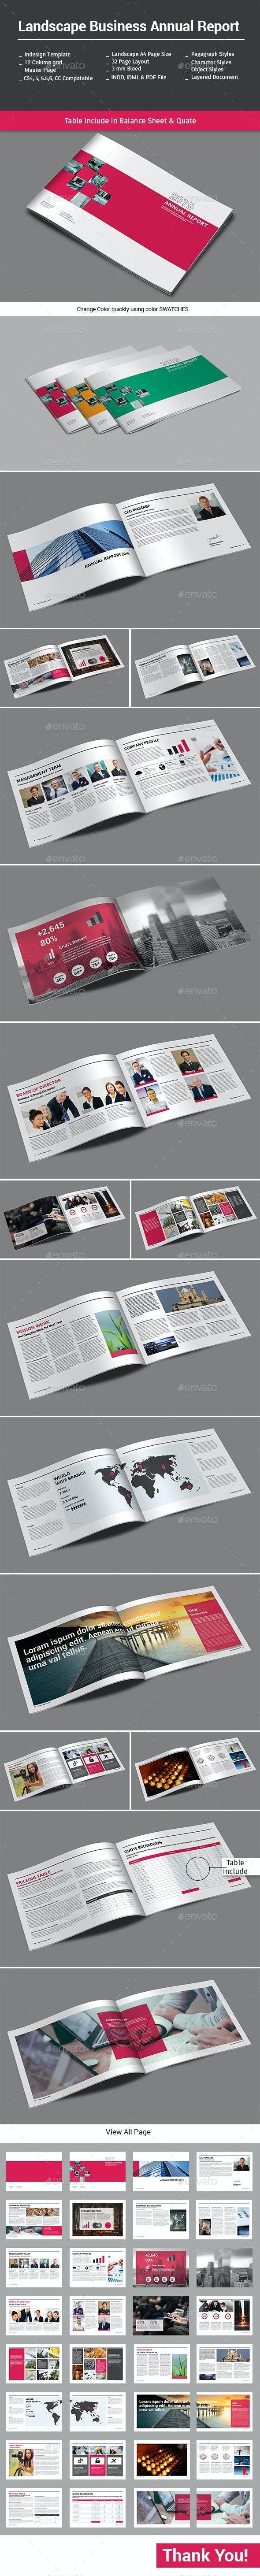 Landscape Business Annual Report - Informational Brochures